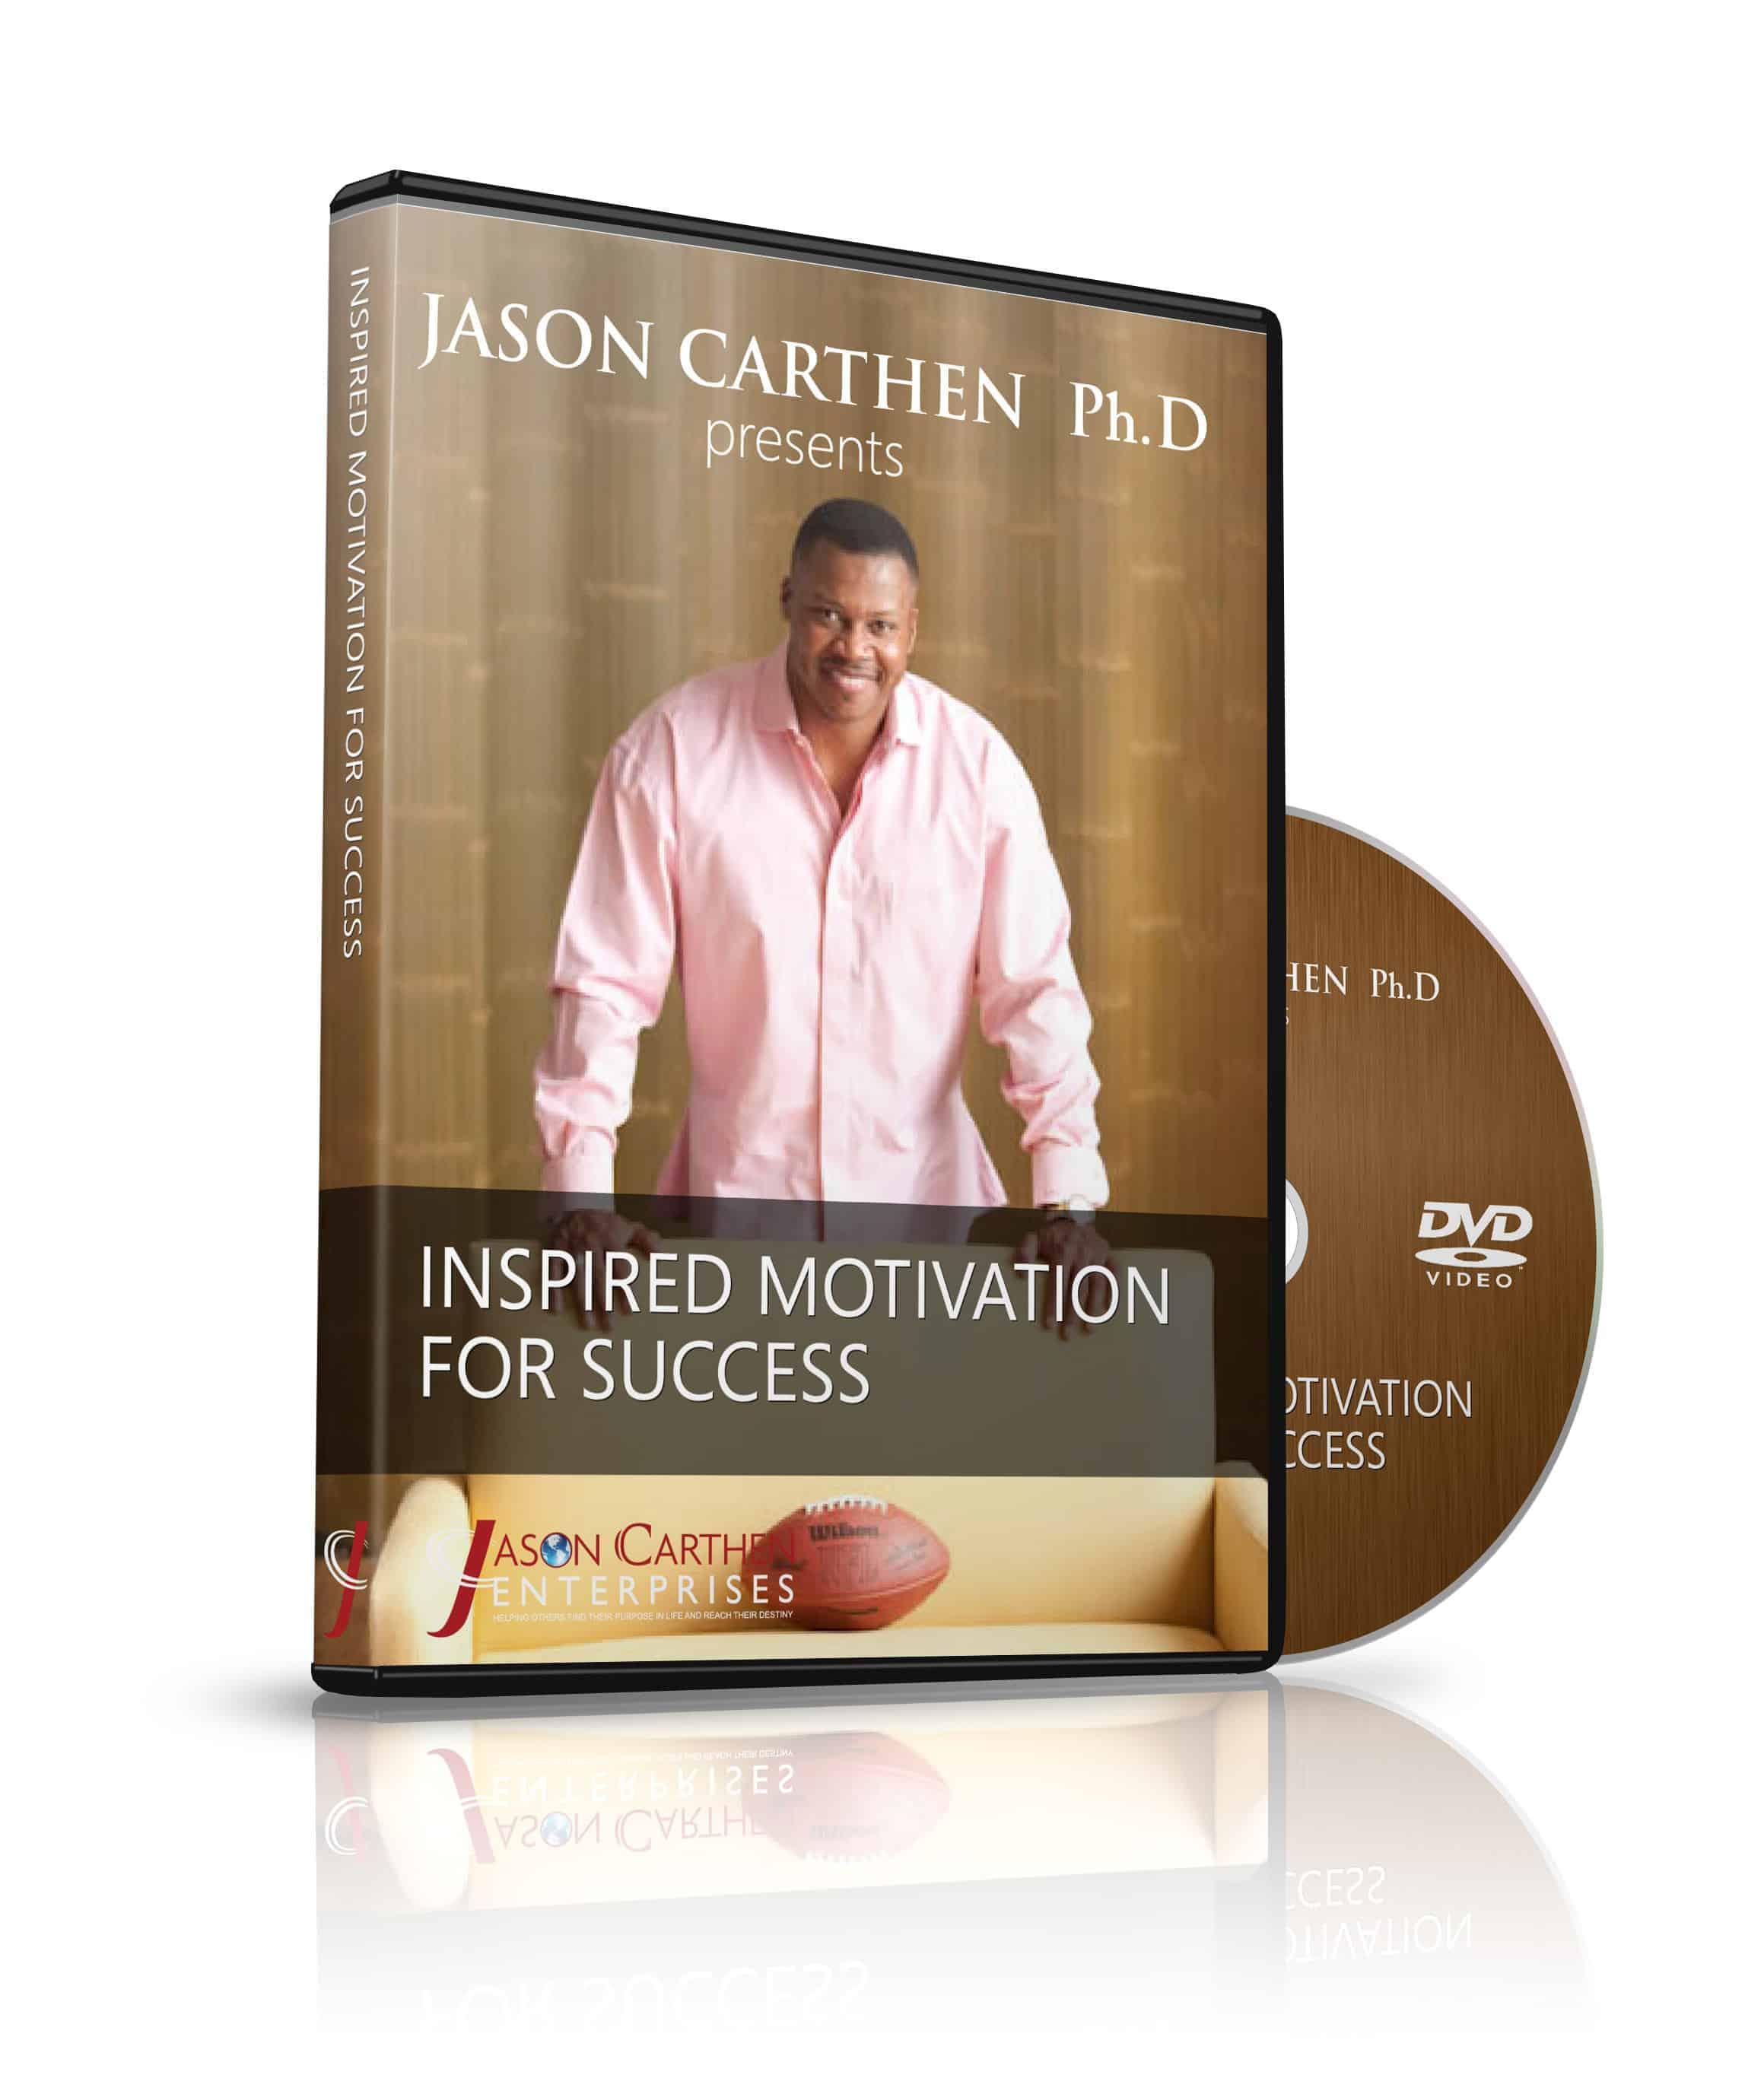 Dr. Jason Carthen Inspired Motivation for Your Success DVD